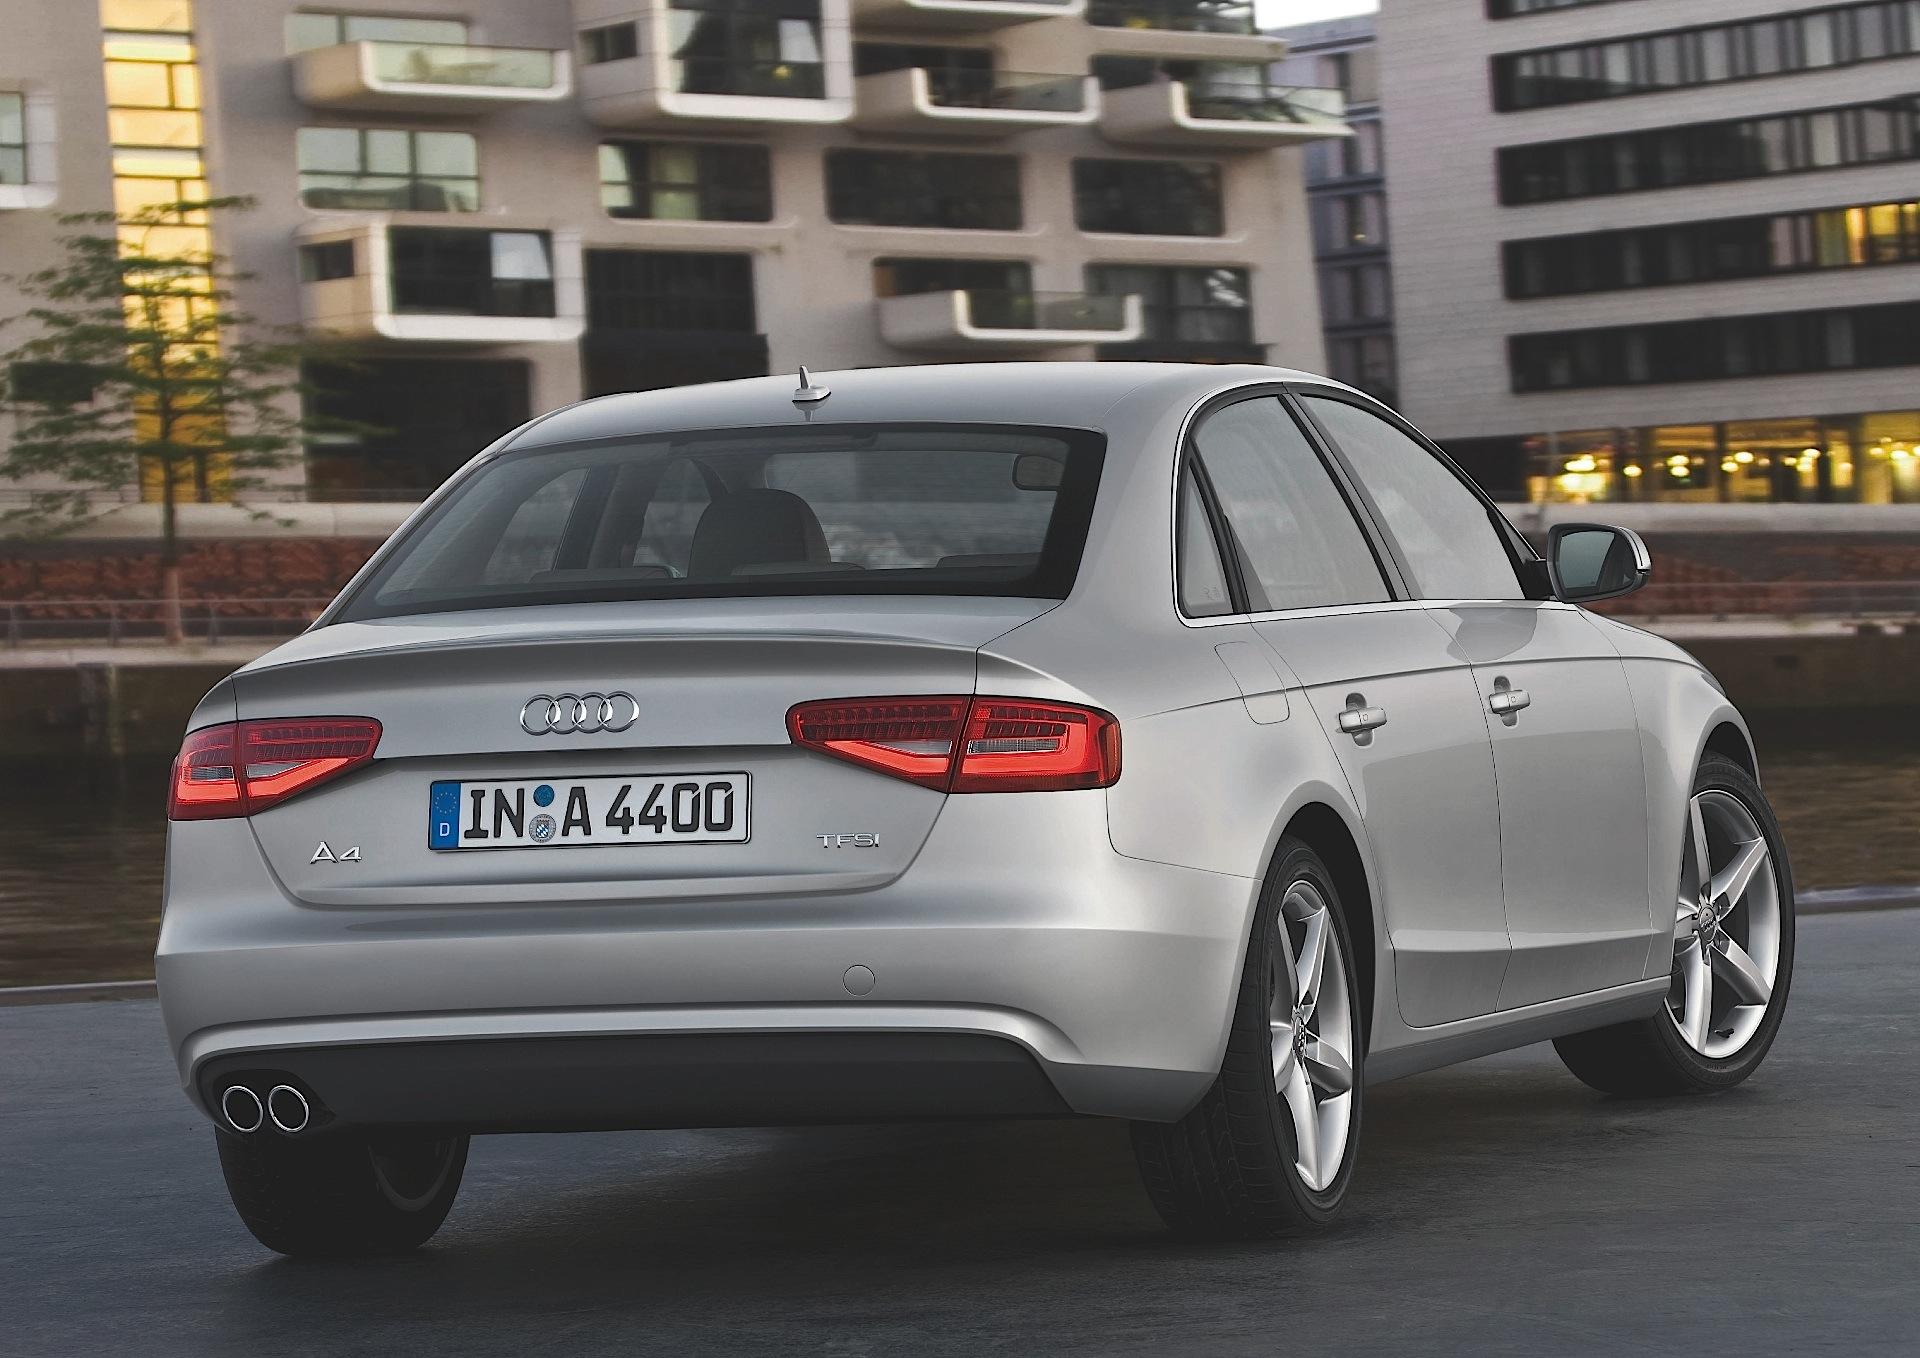 2007 Audi A4 Image 18